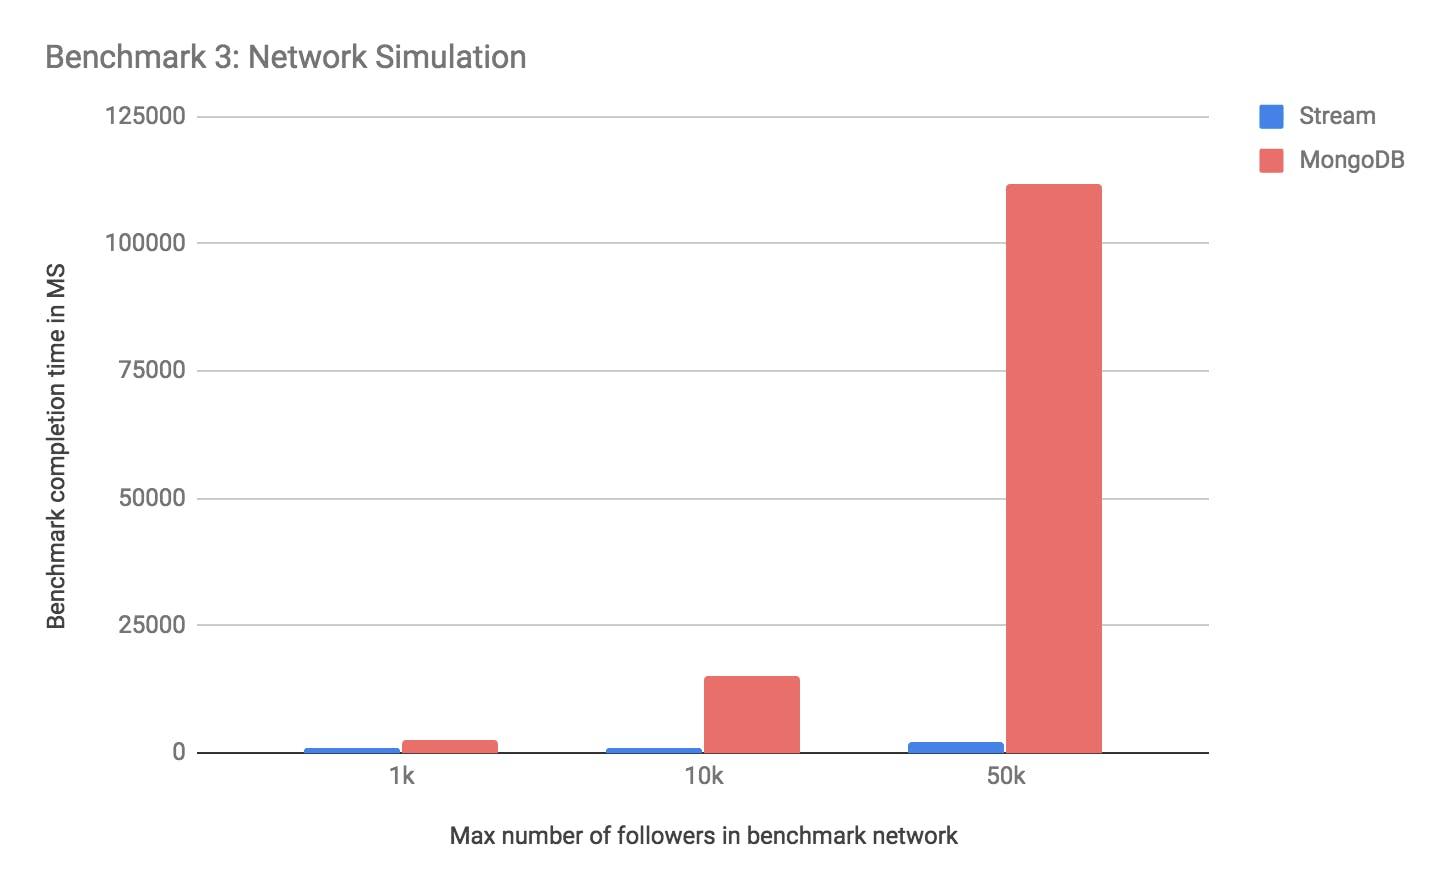 social network simulation and capacity. activity feed mongodb vs stream